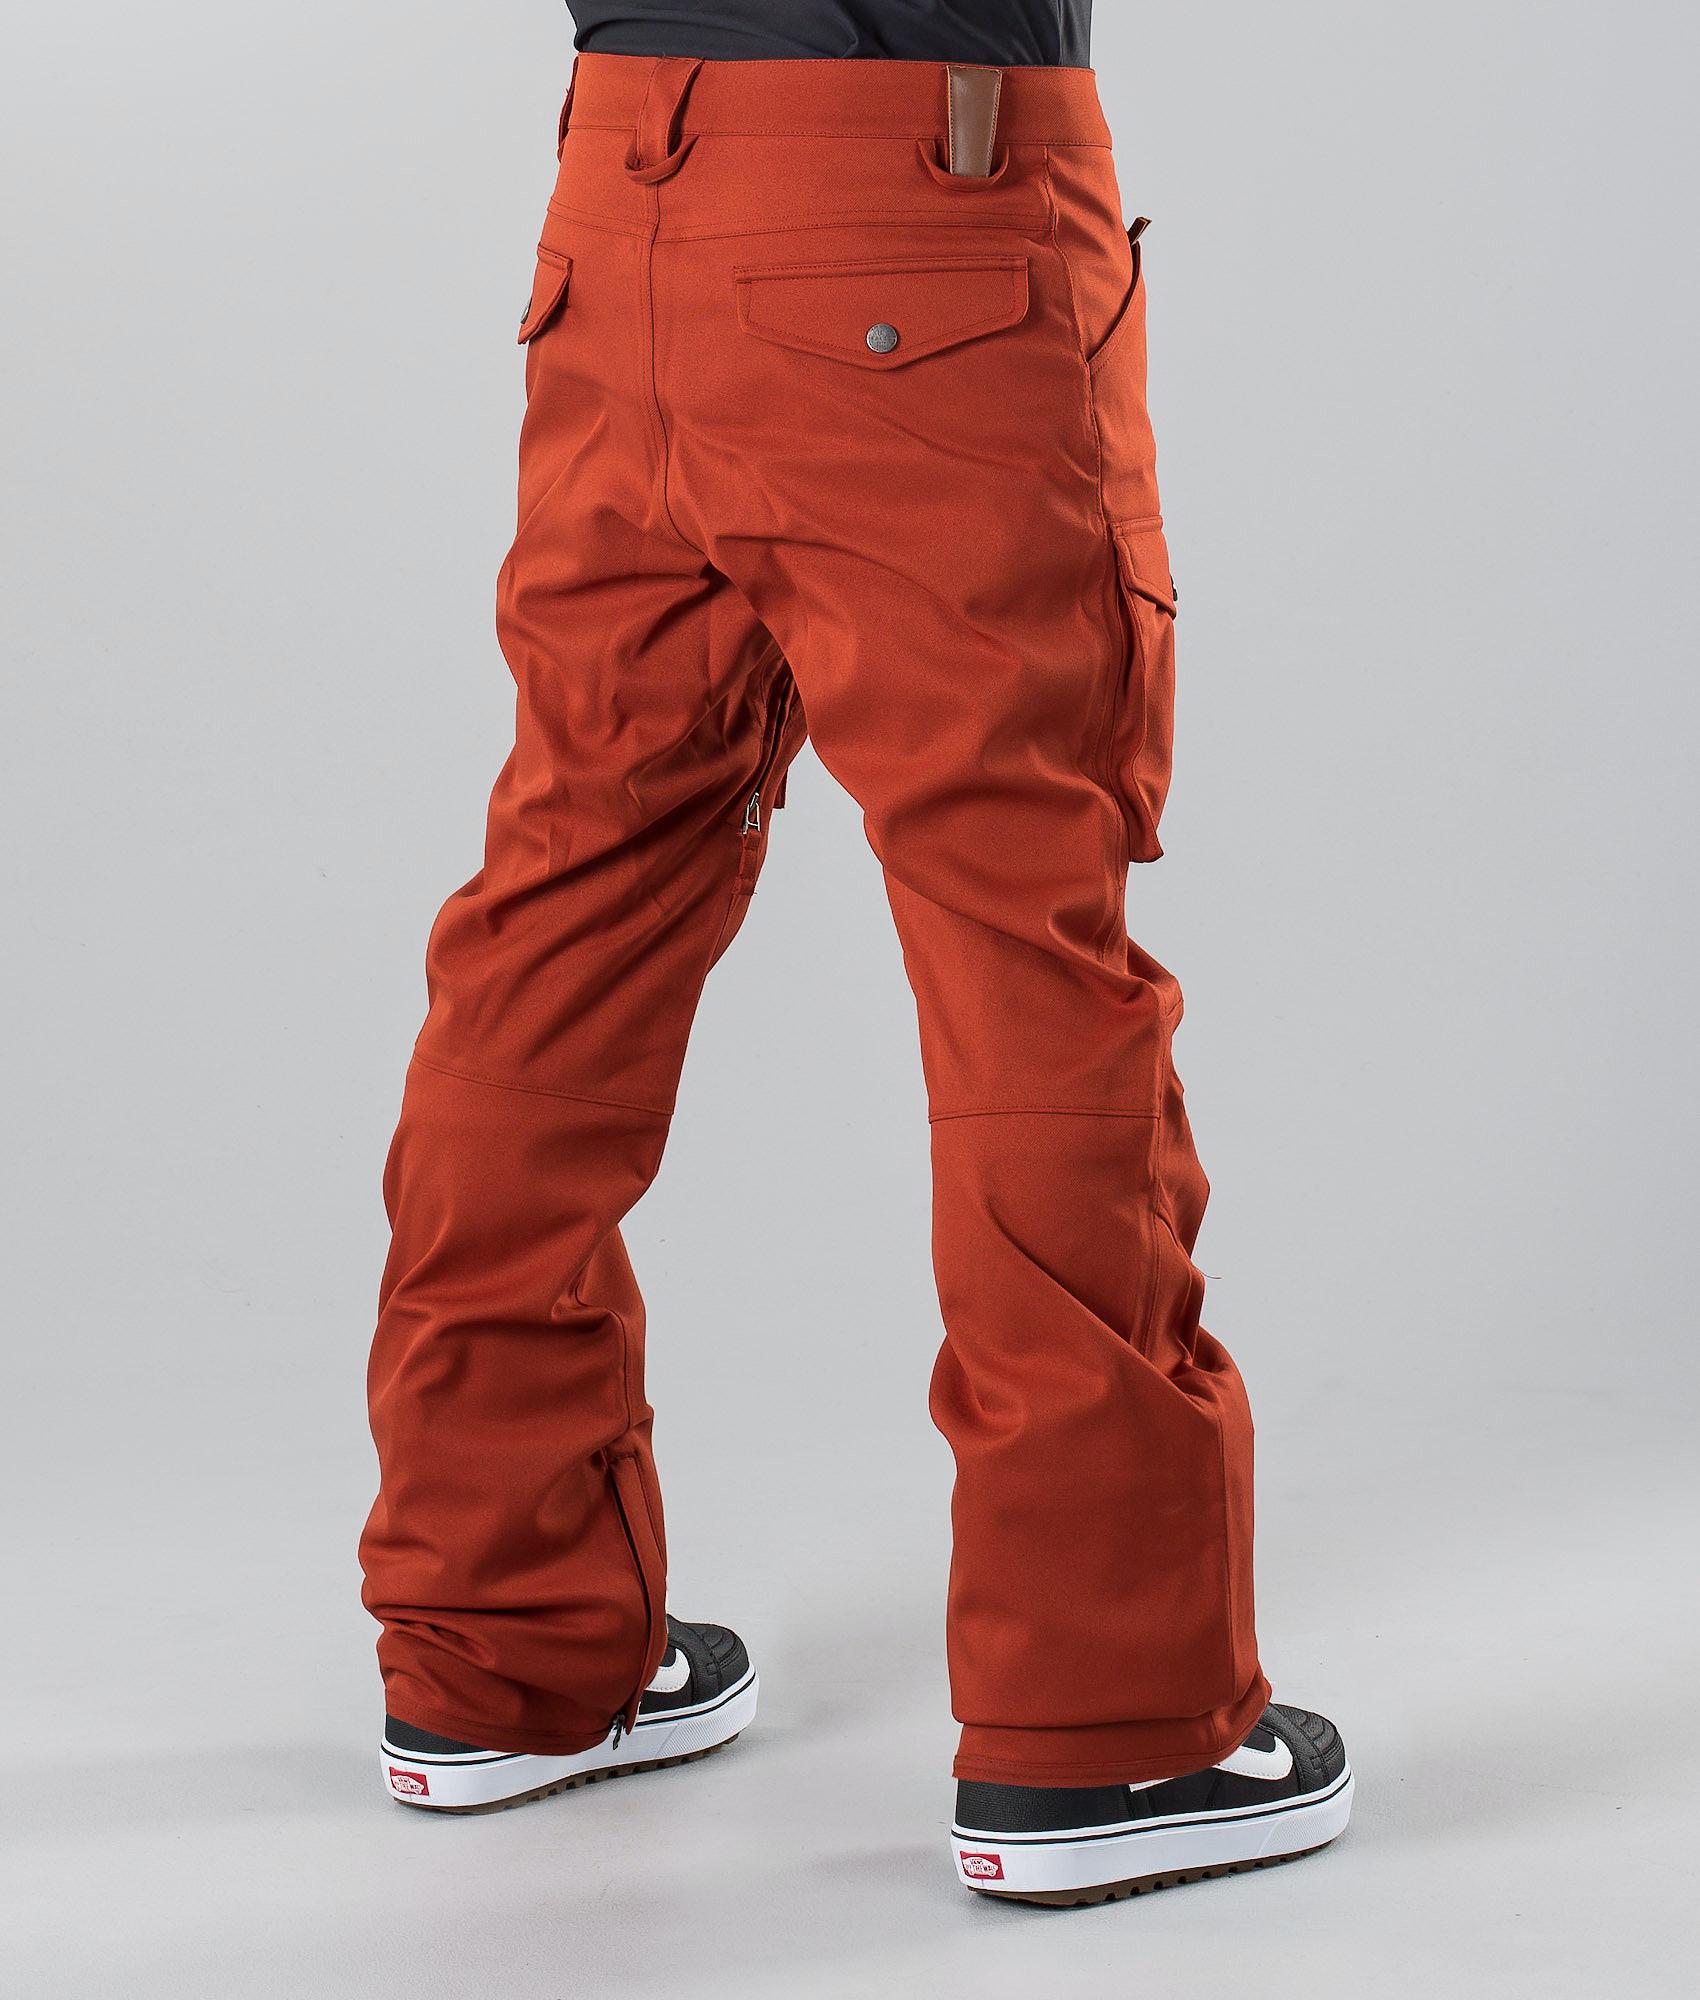 043275bf684c5 L1 Slim Cargo Pantalon de Snowboard